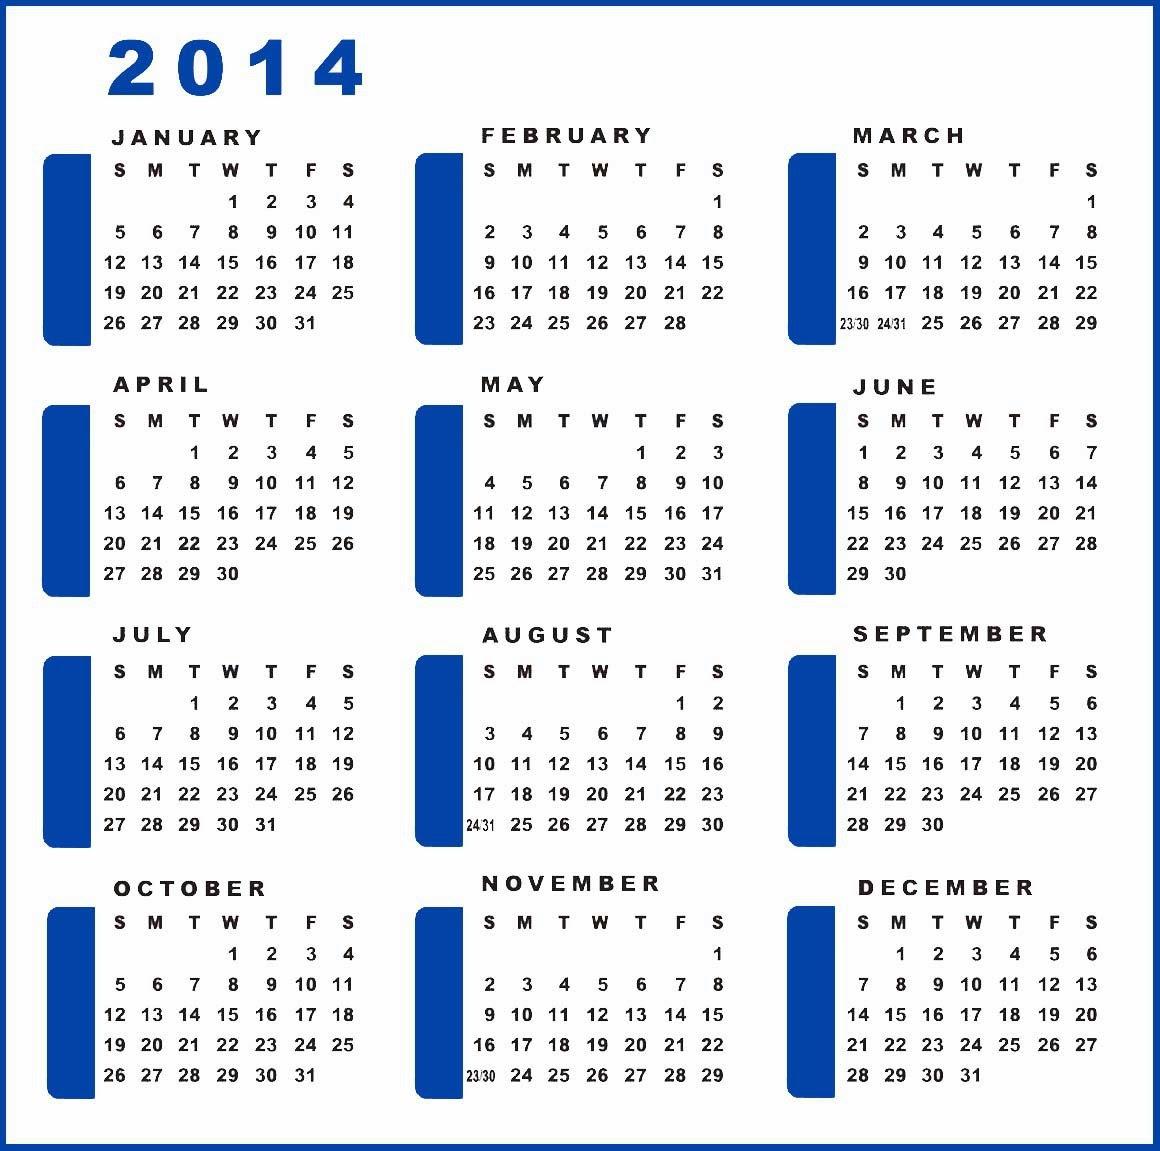 yearly planning calendar template 2014 - yearly calendar 2014 printable calendar 2014 blank